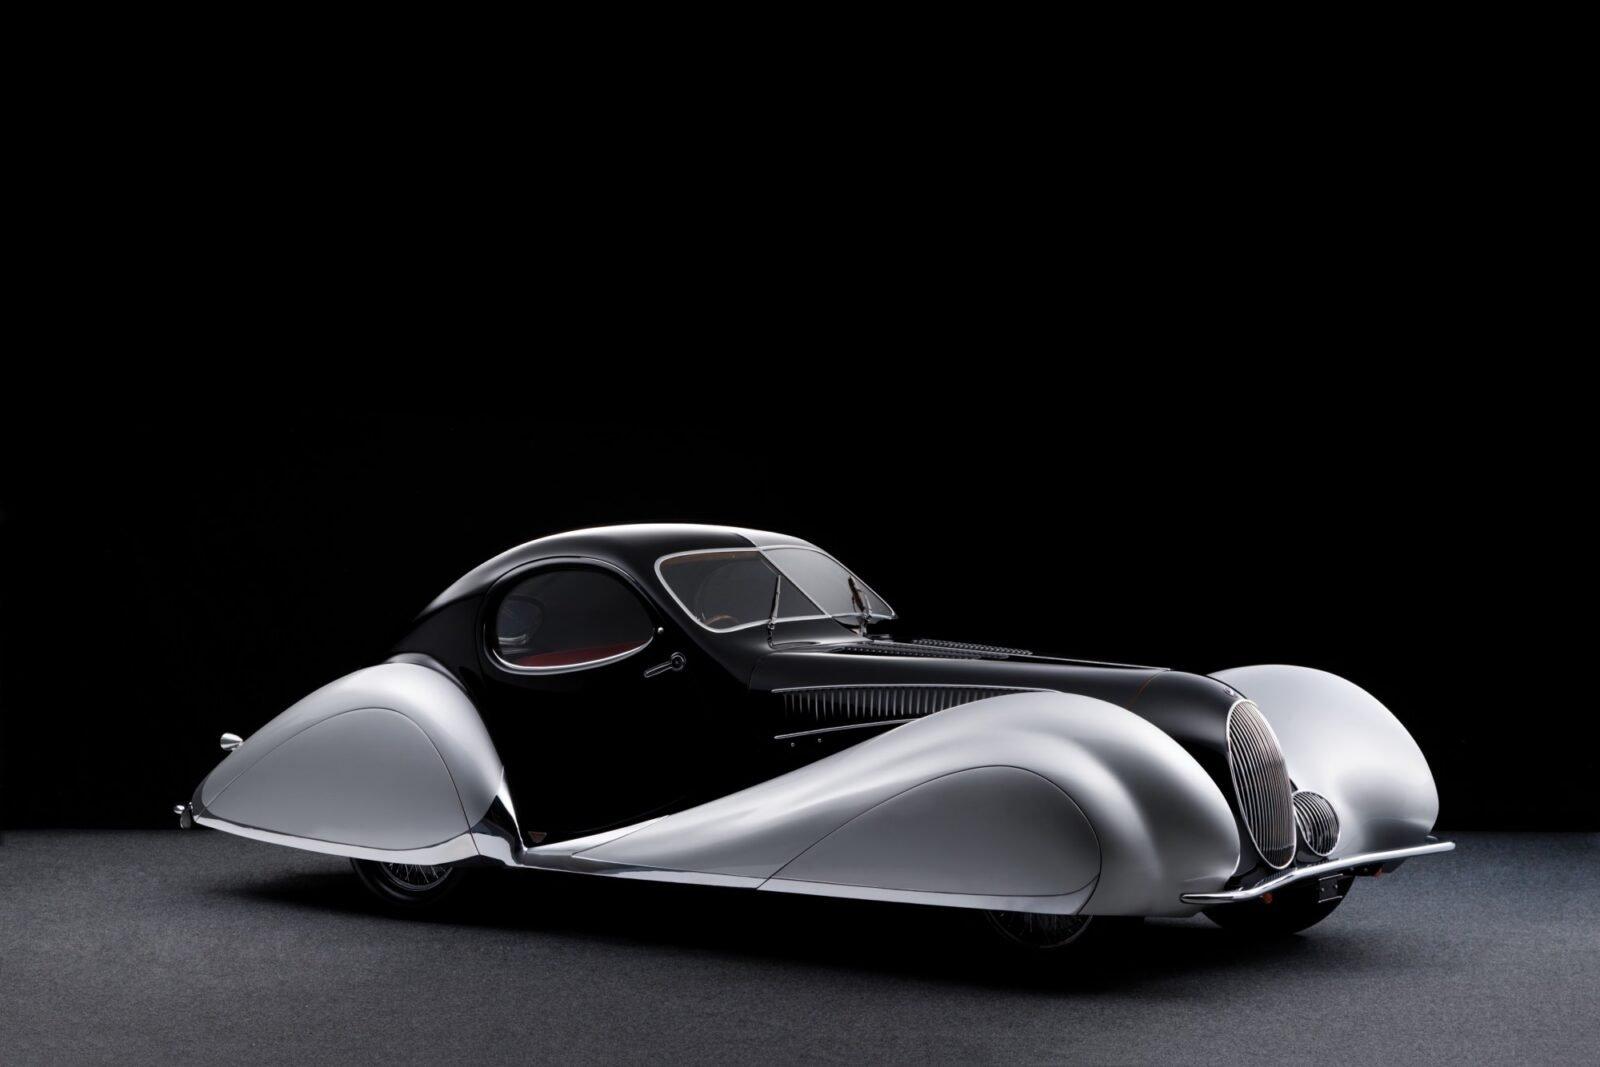 talbot lago car 21 1600x1067 - 1937 Talbot-Lago T150-C SS 'Goutte d'Eau' Coupé